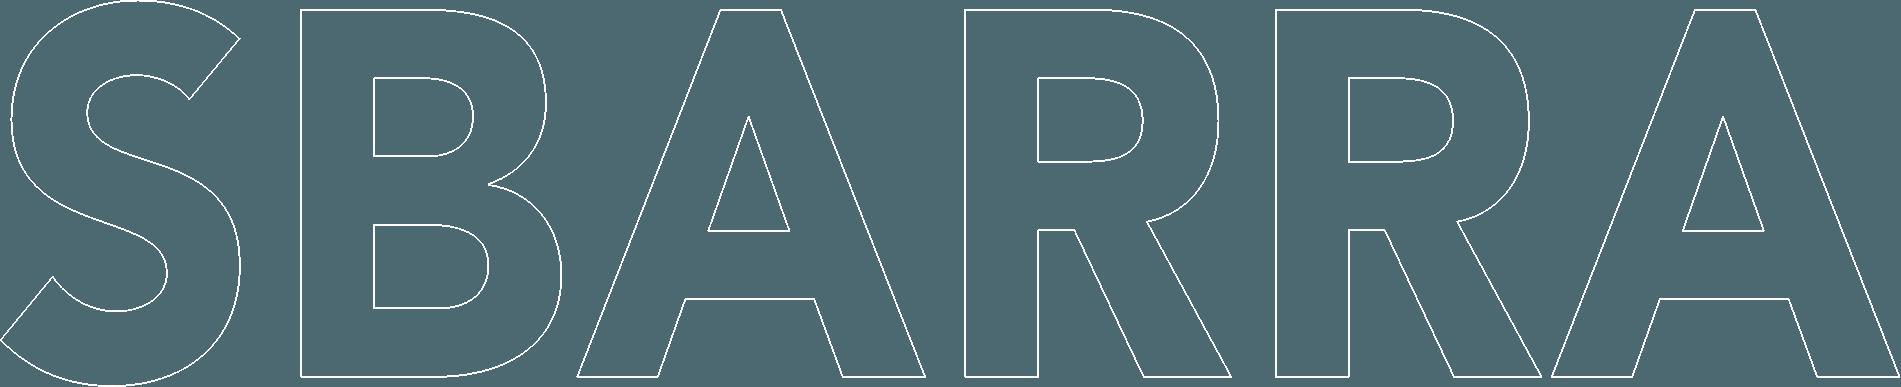 sbarra outline - Home